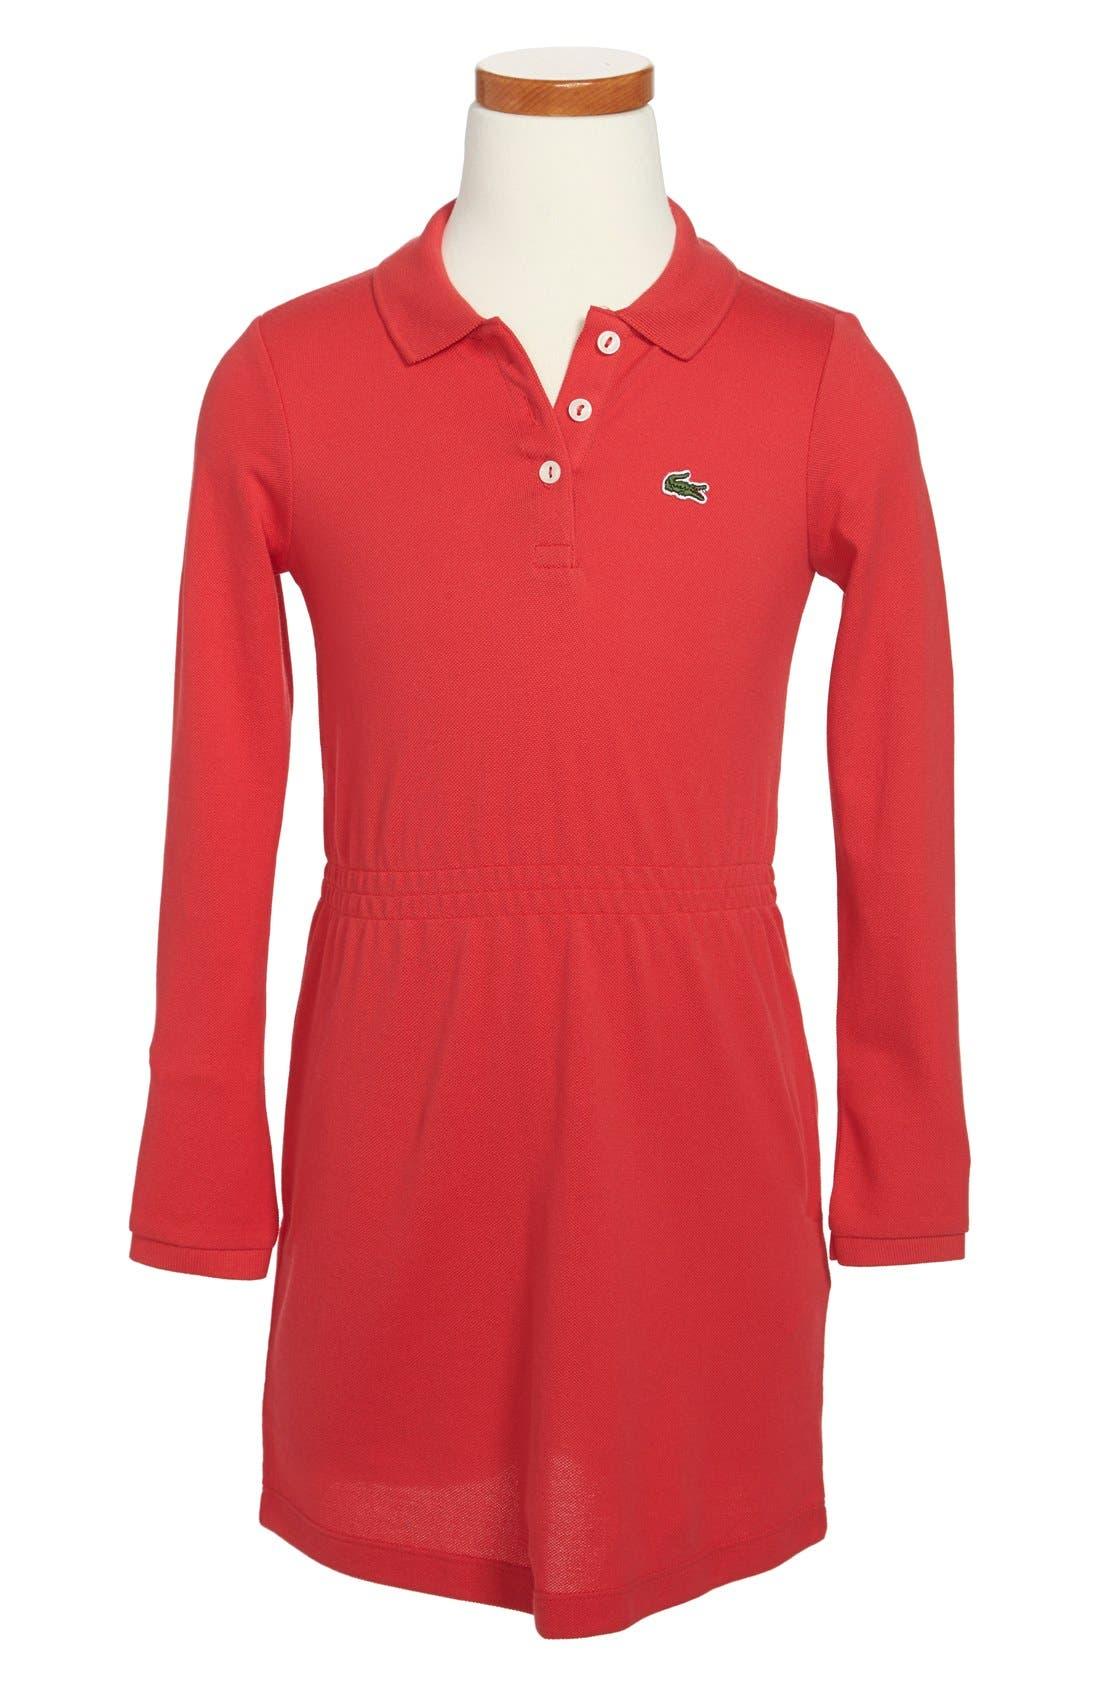 Main Image - Lacoste Piqué Polo Dress (Toddler Girls & Little Girls)